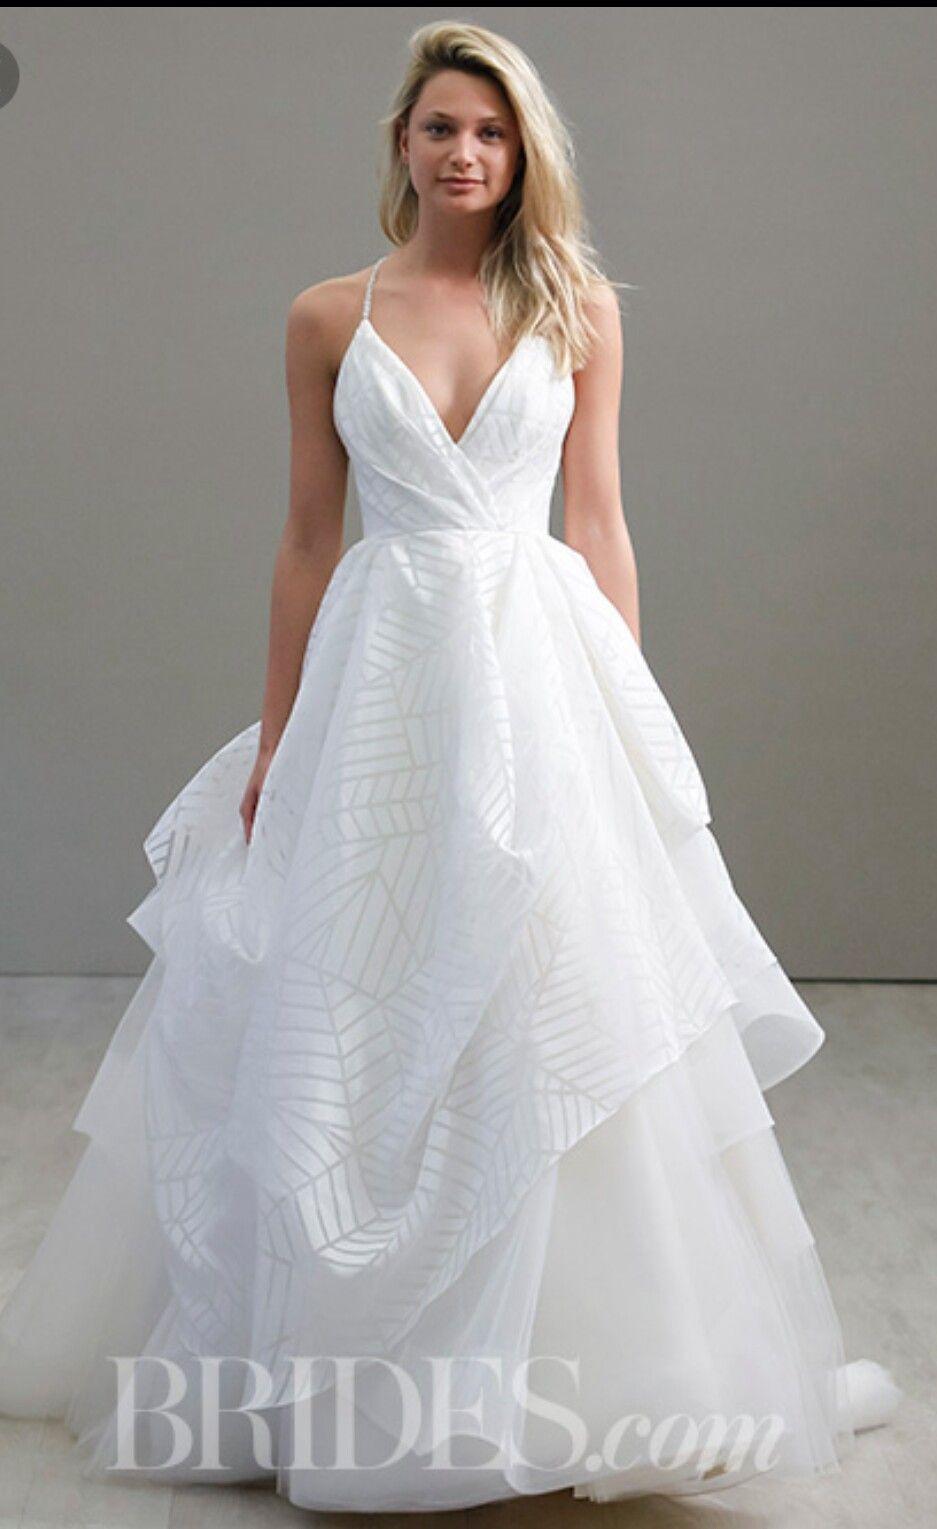 Pin by Brittany Hopkins on wedding dresses | Pinterest | Wedding ...